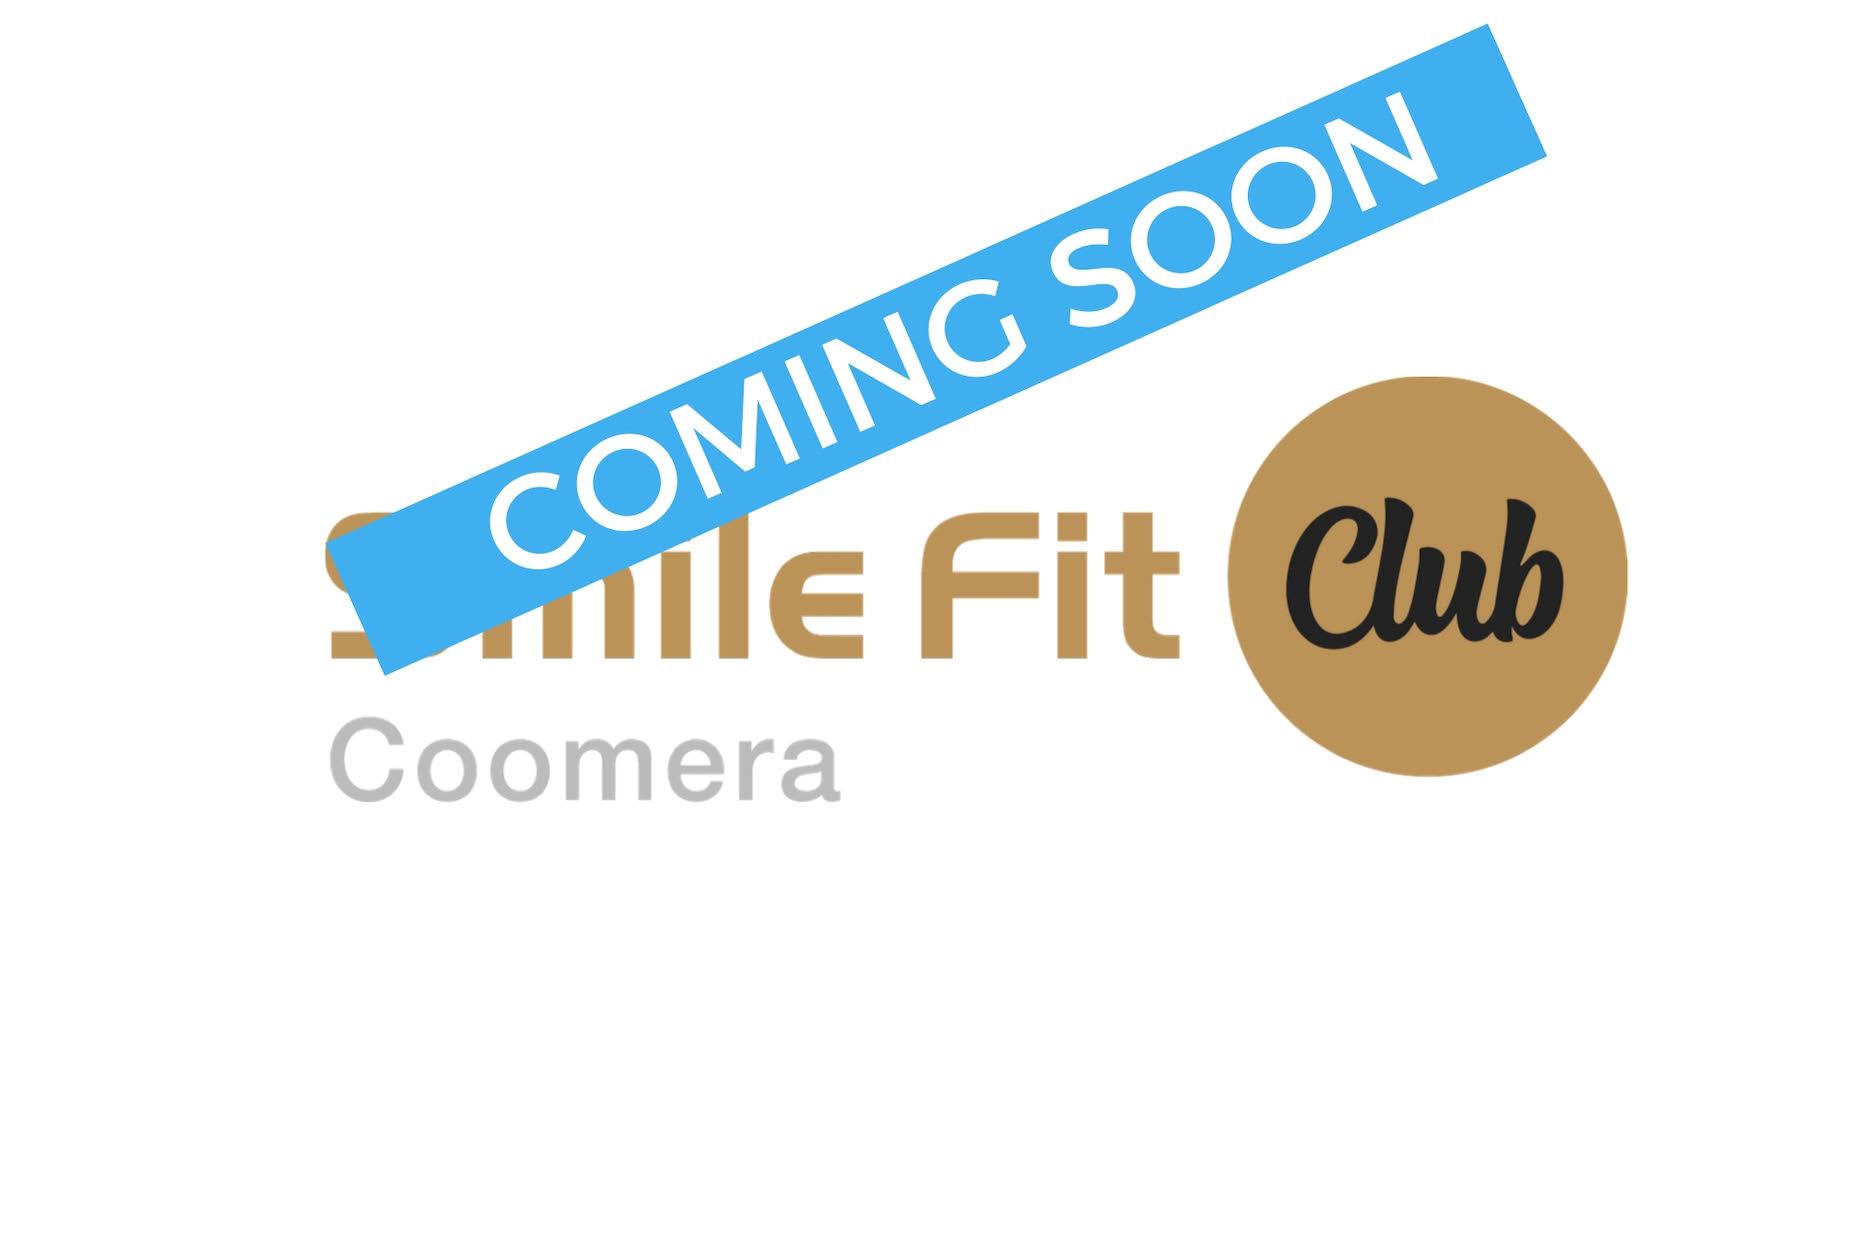 Smile Fit Club Coomera City Centre